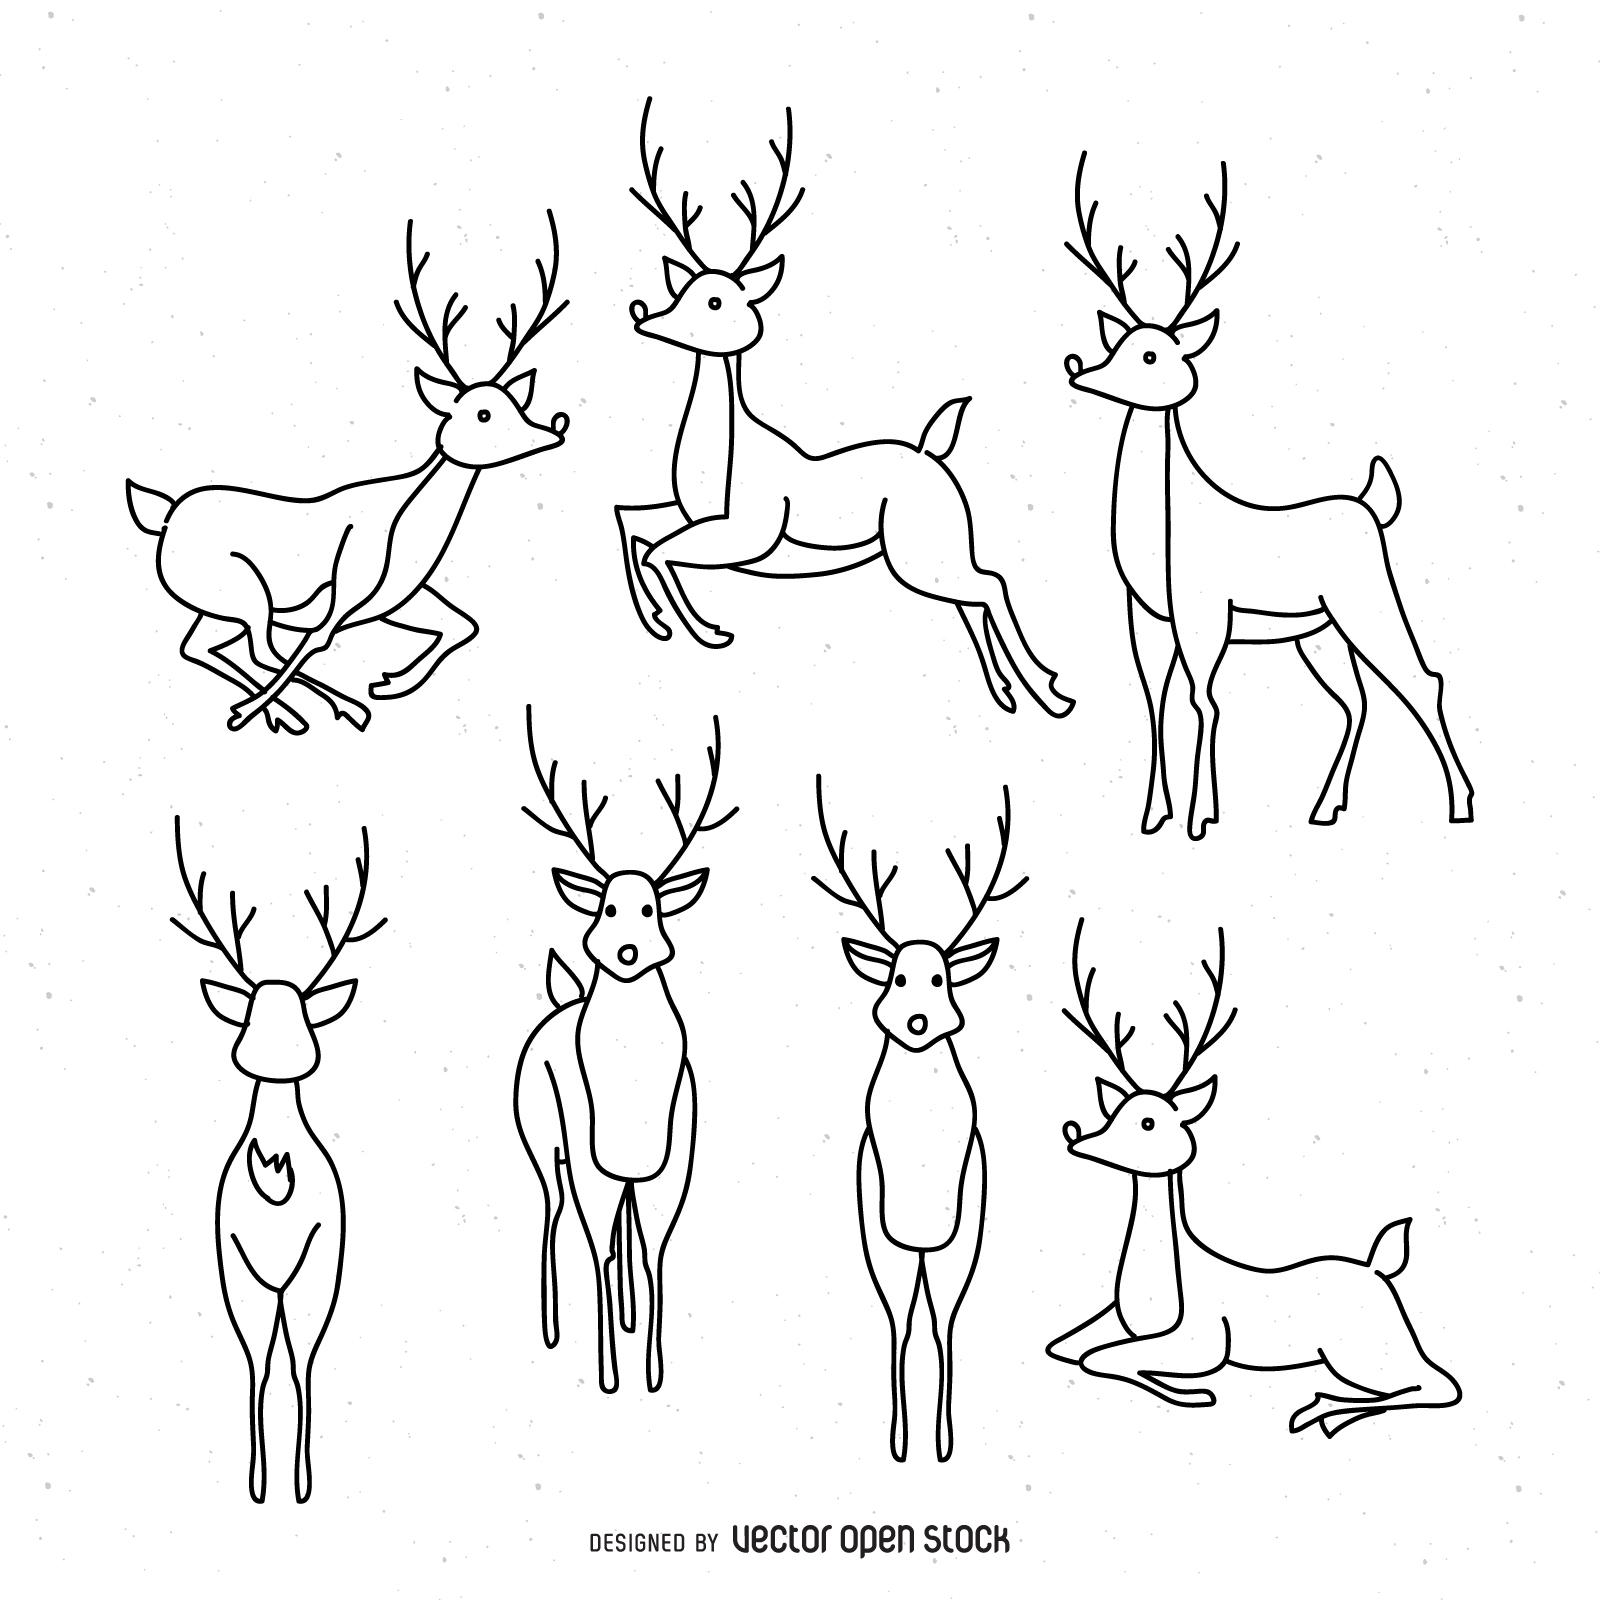 Drawn reindeer illustration Graphics Reindeer & to illustration